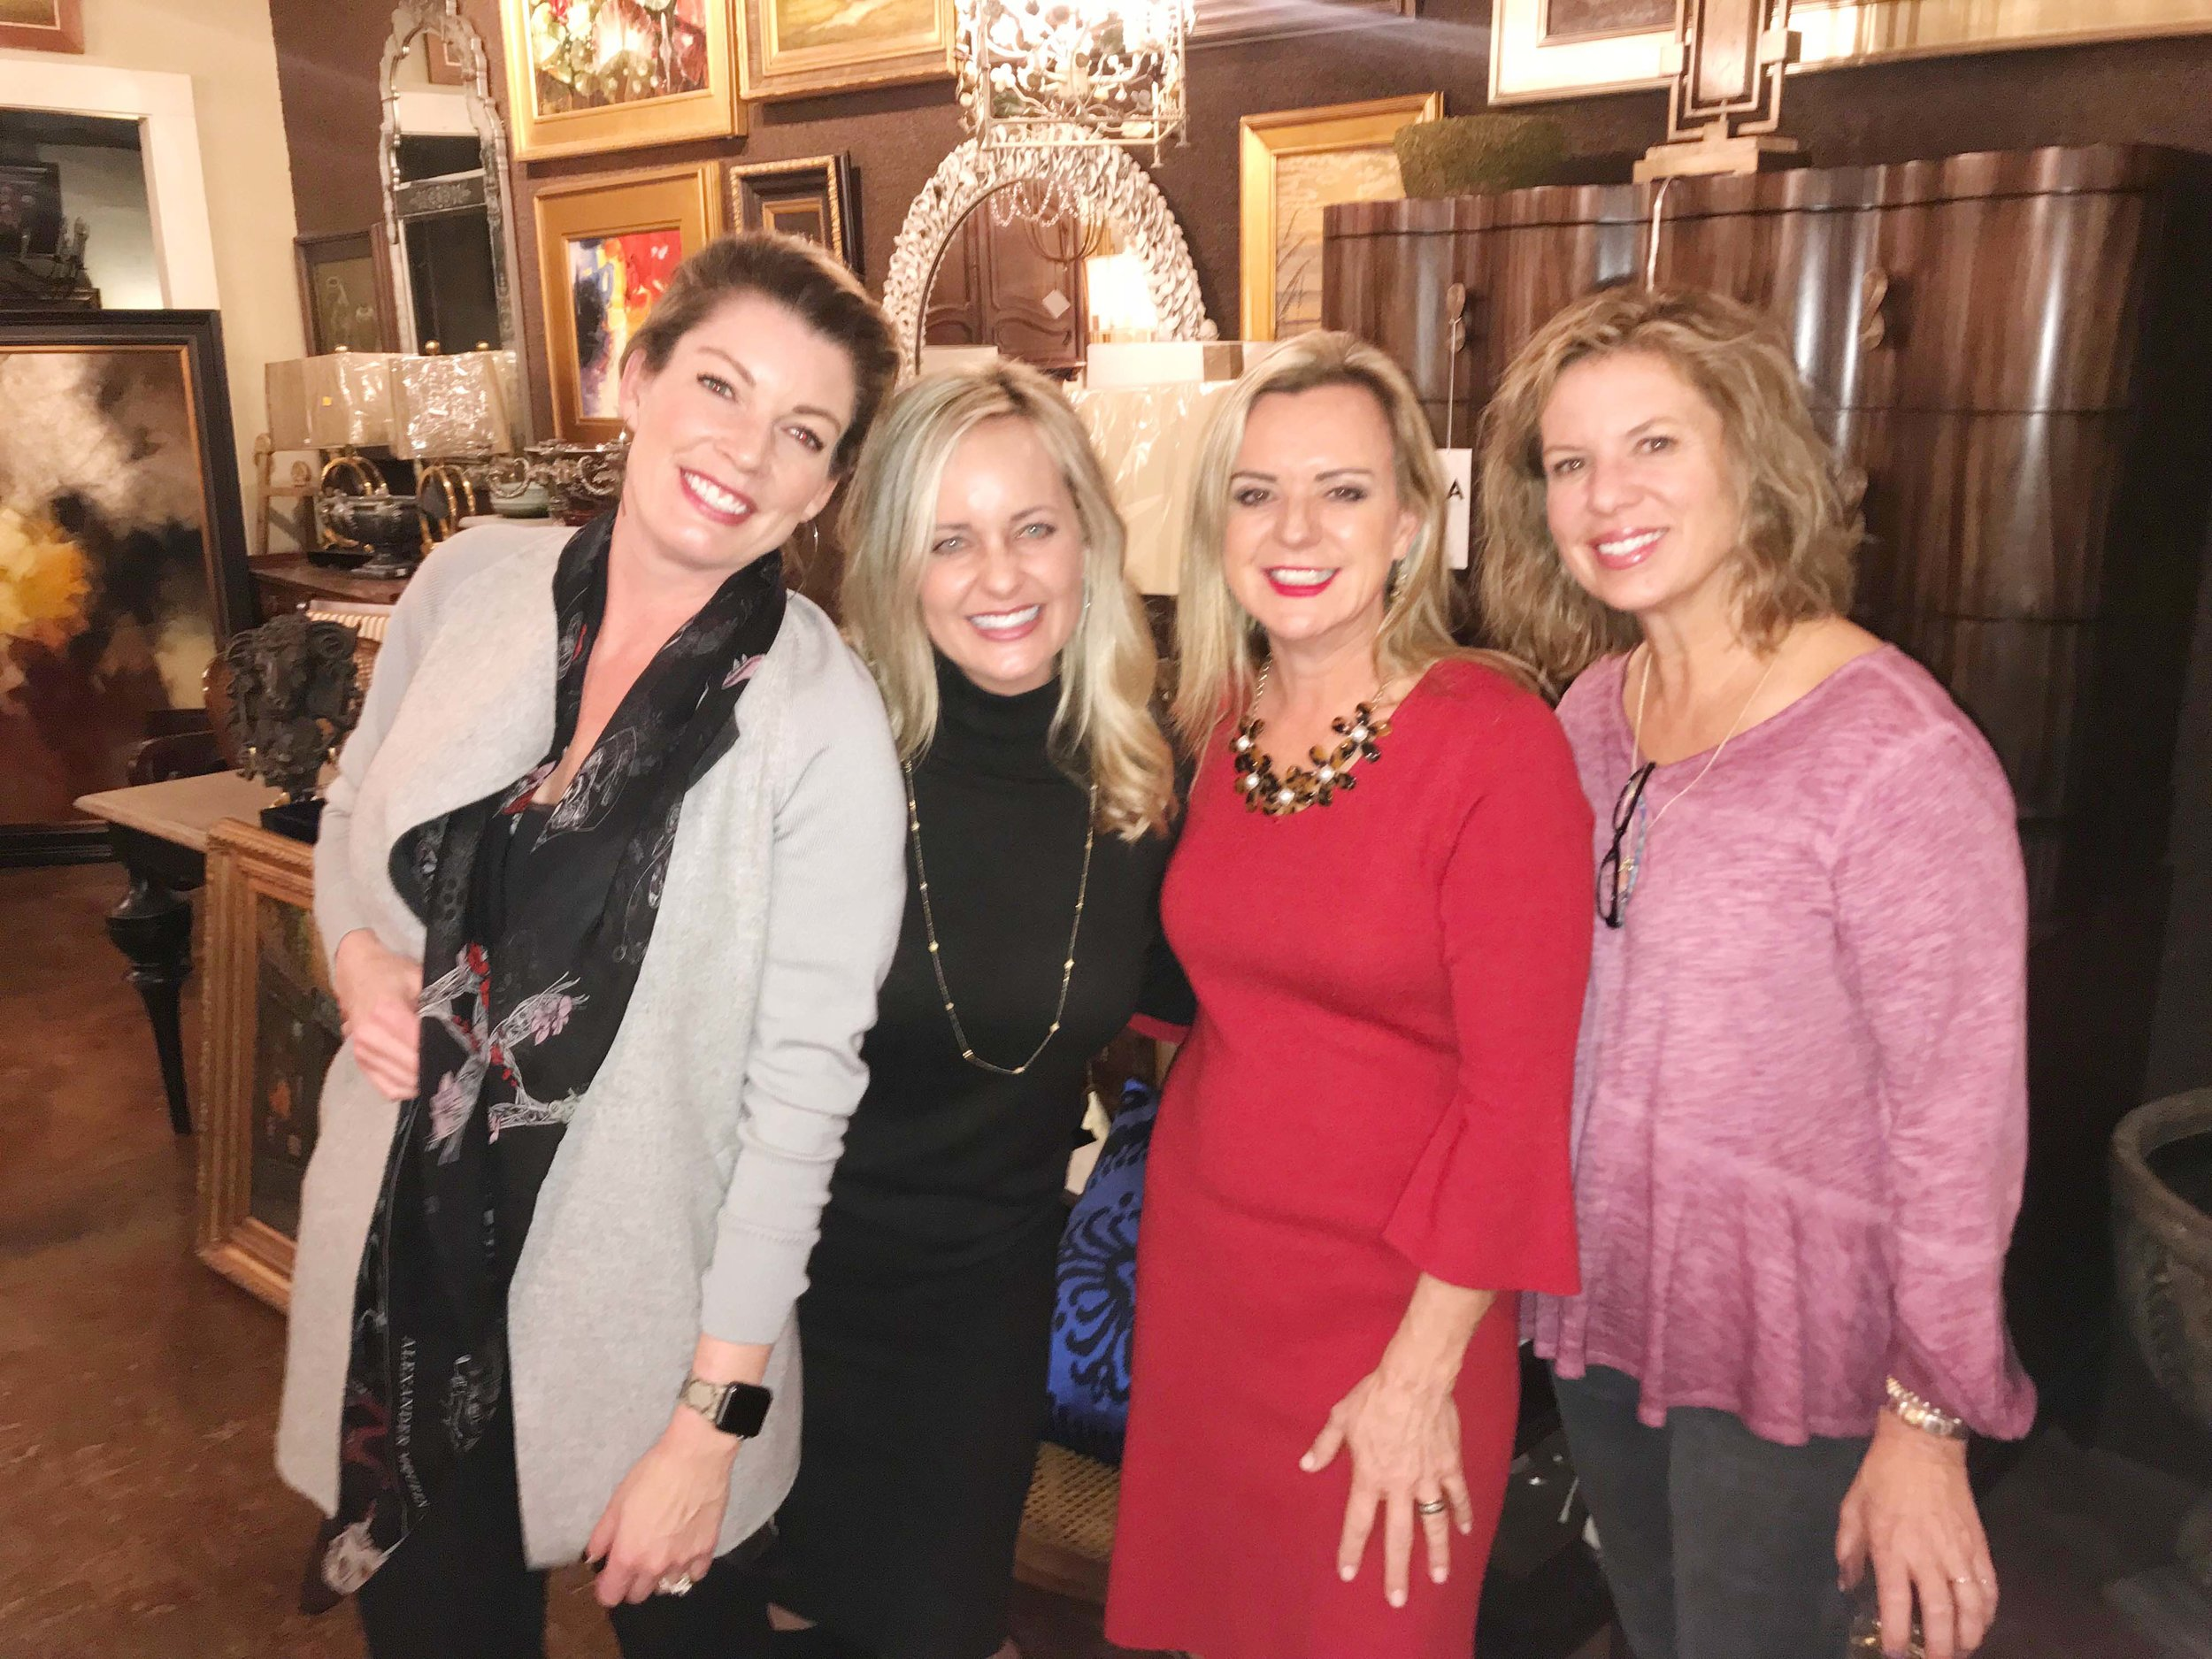 Aria Potter, Amberly Stussy, Mary Beth Womack and Deidre Smith